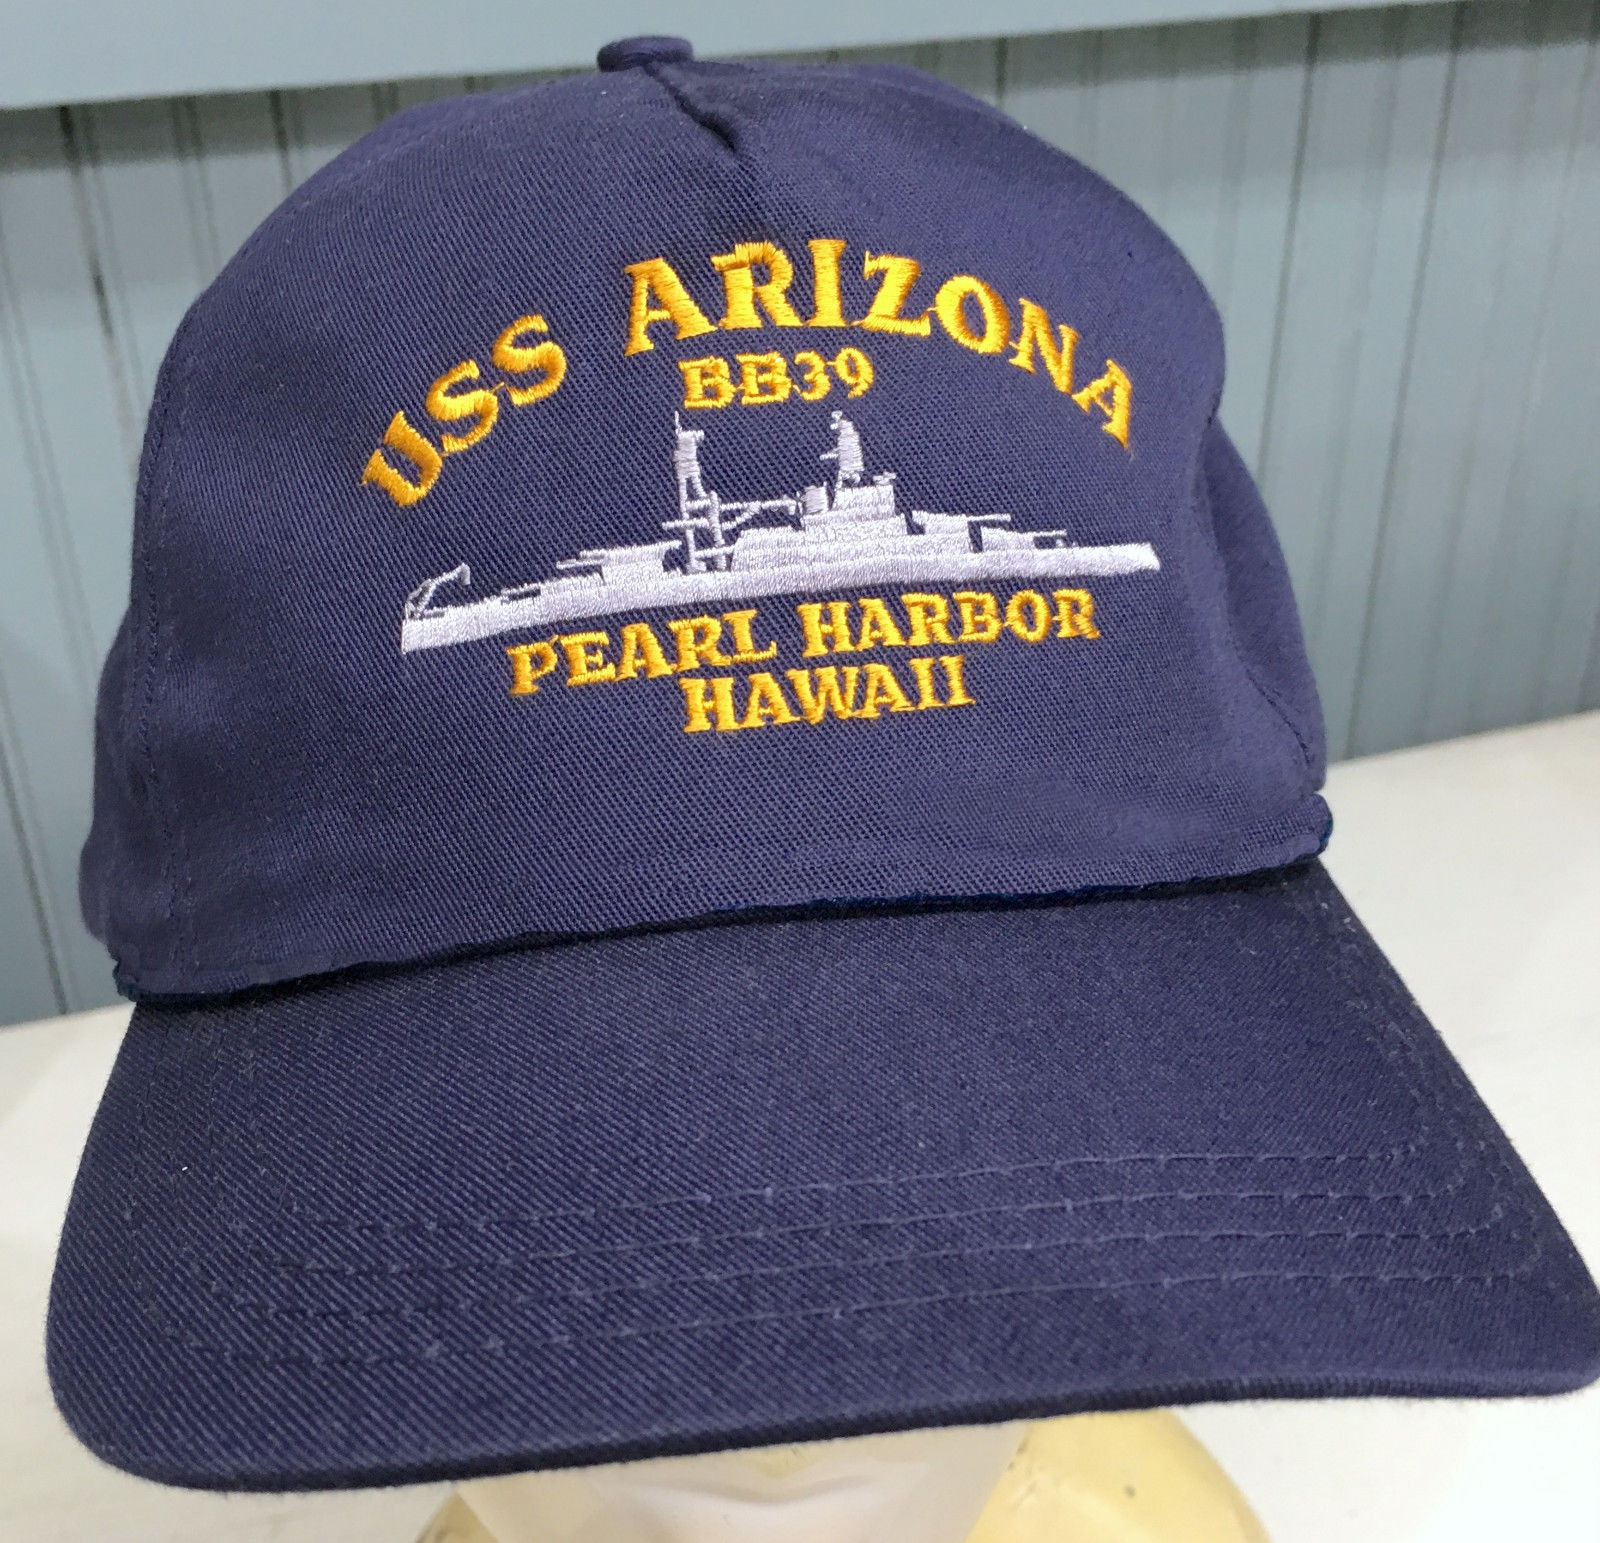 sadao asada from mahan to pearl harbor Printed USS Arizona Pearl Harbor Snapback Baseball Cap Hat Original